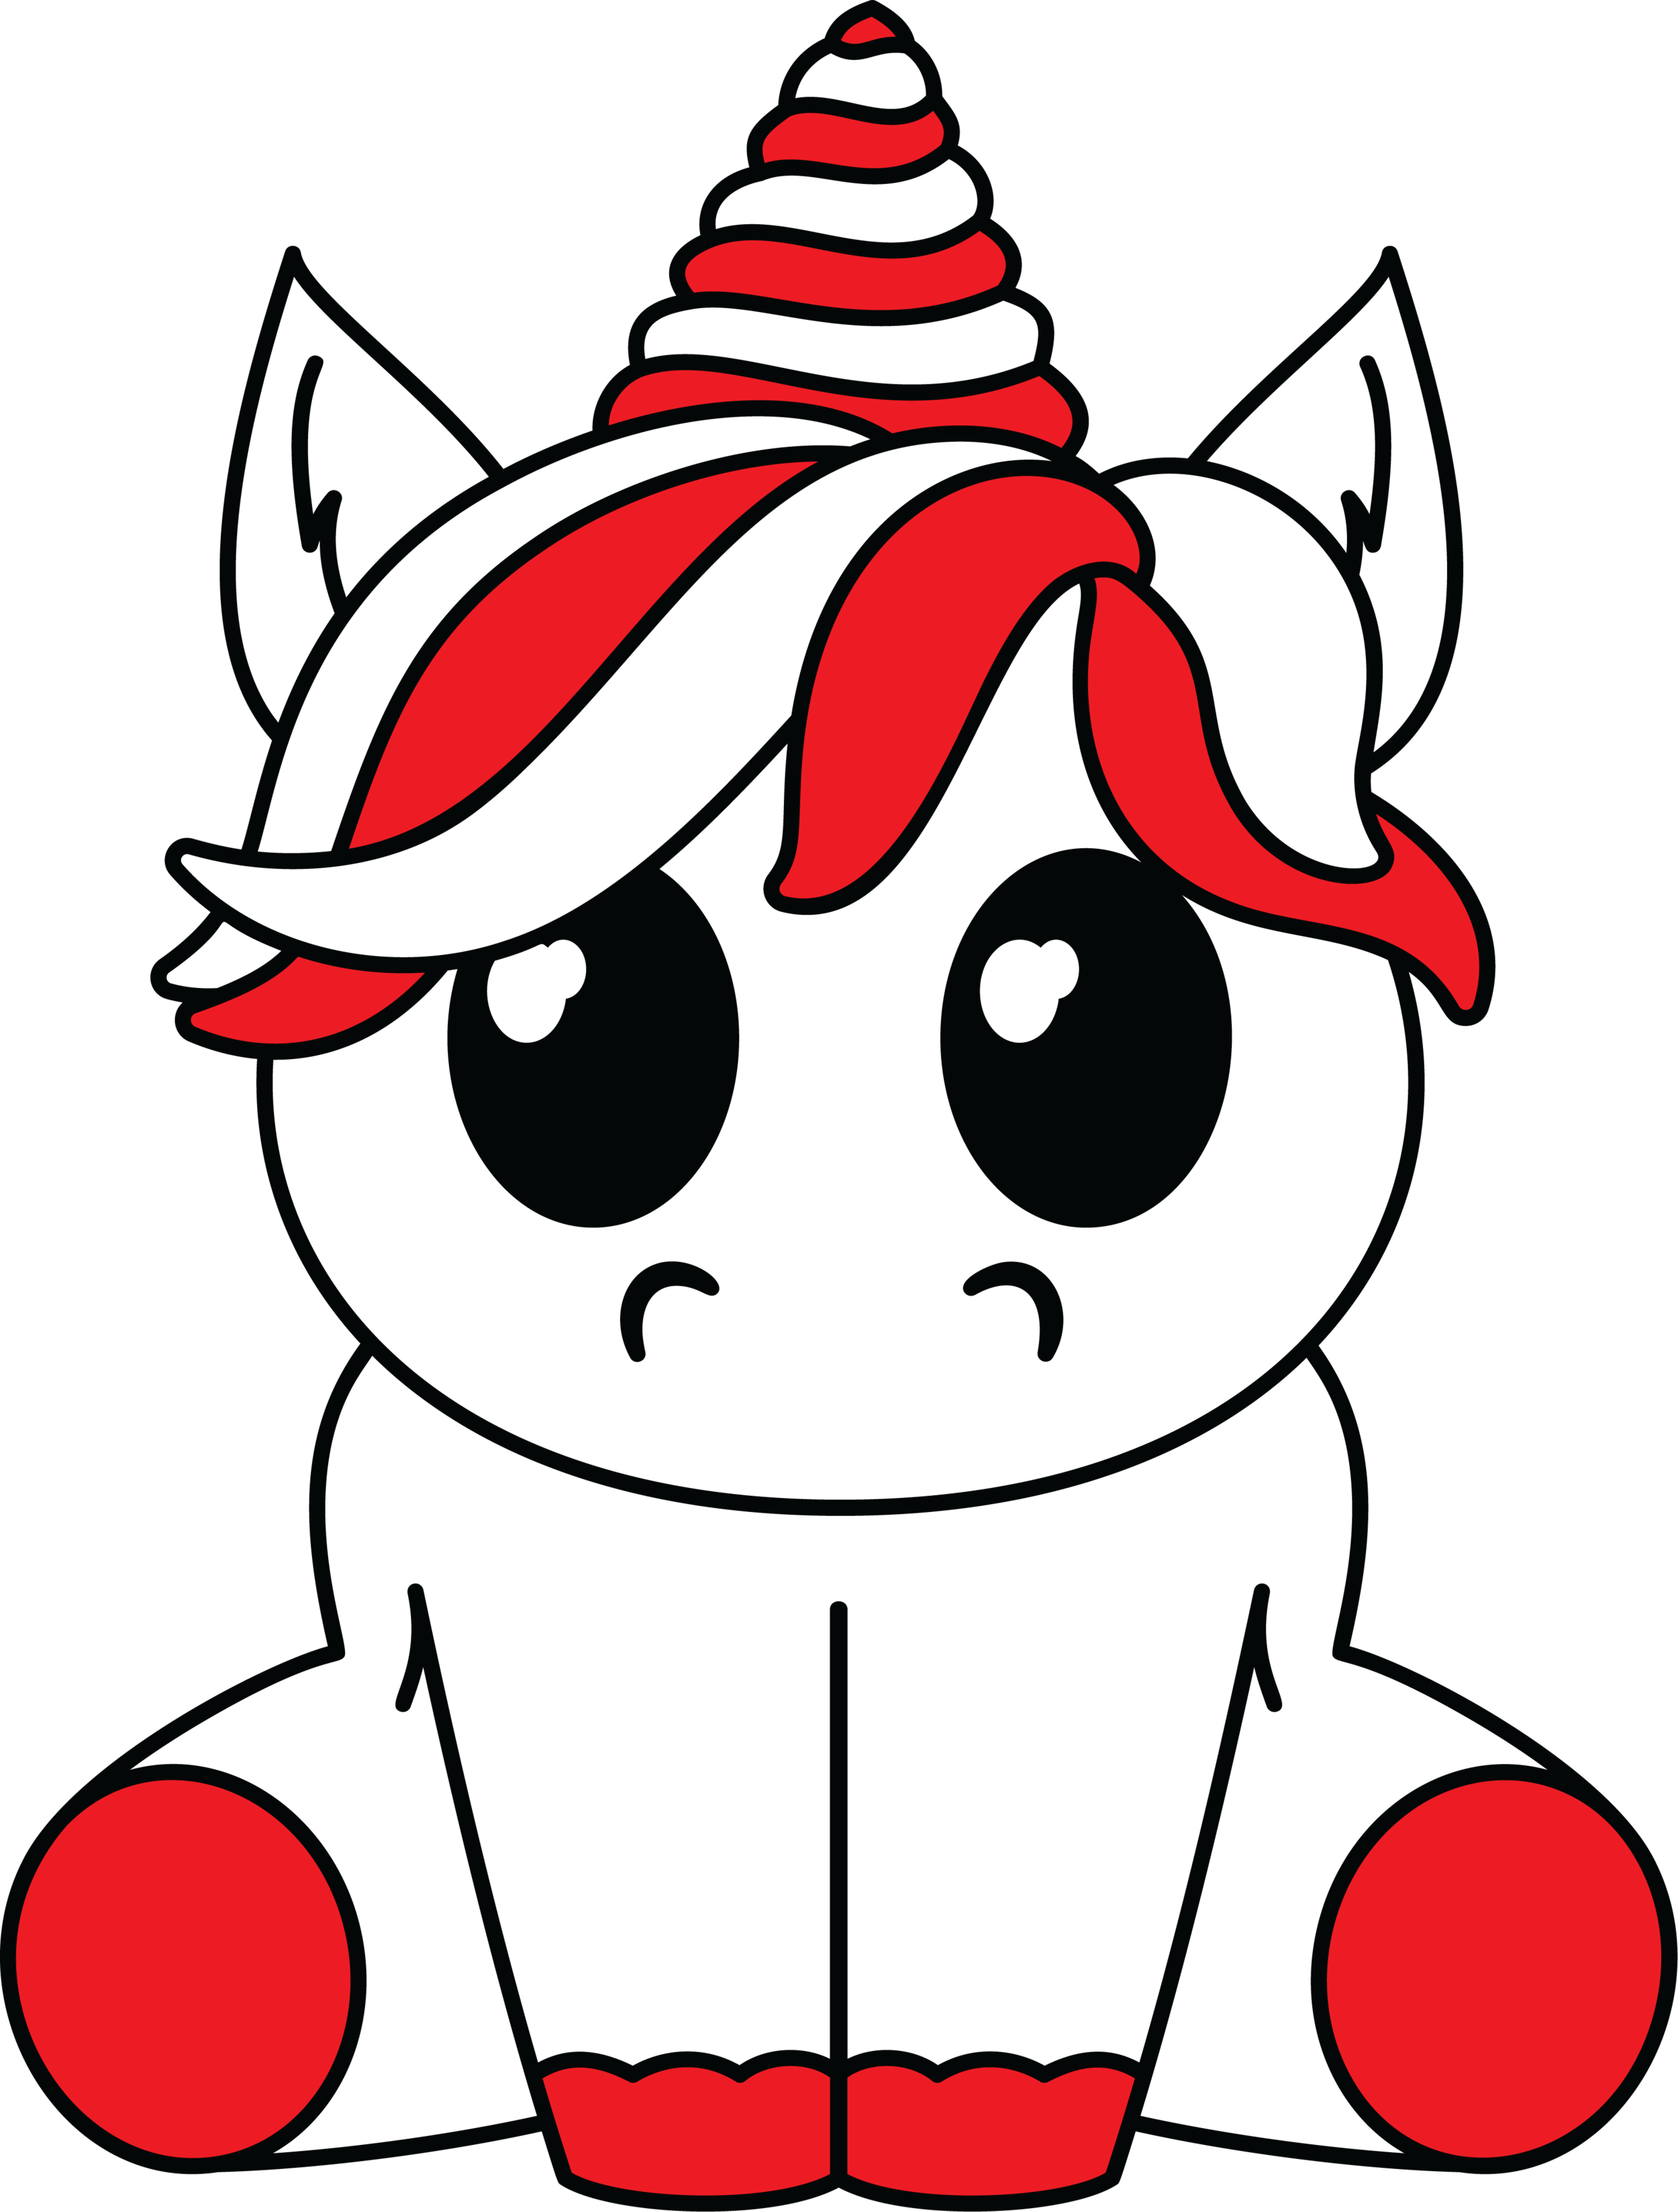 kld-Candy-Cane-Unicorn_V1.png